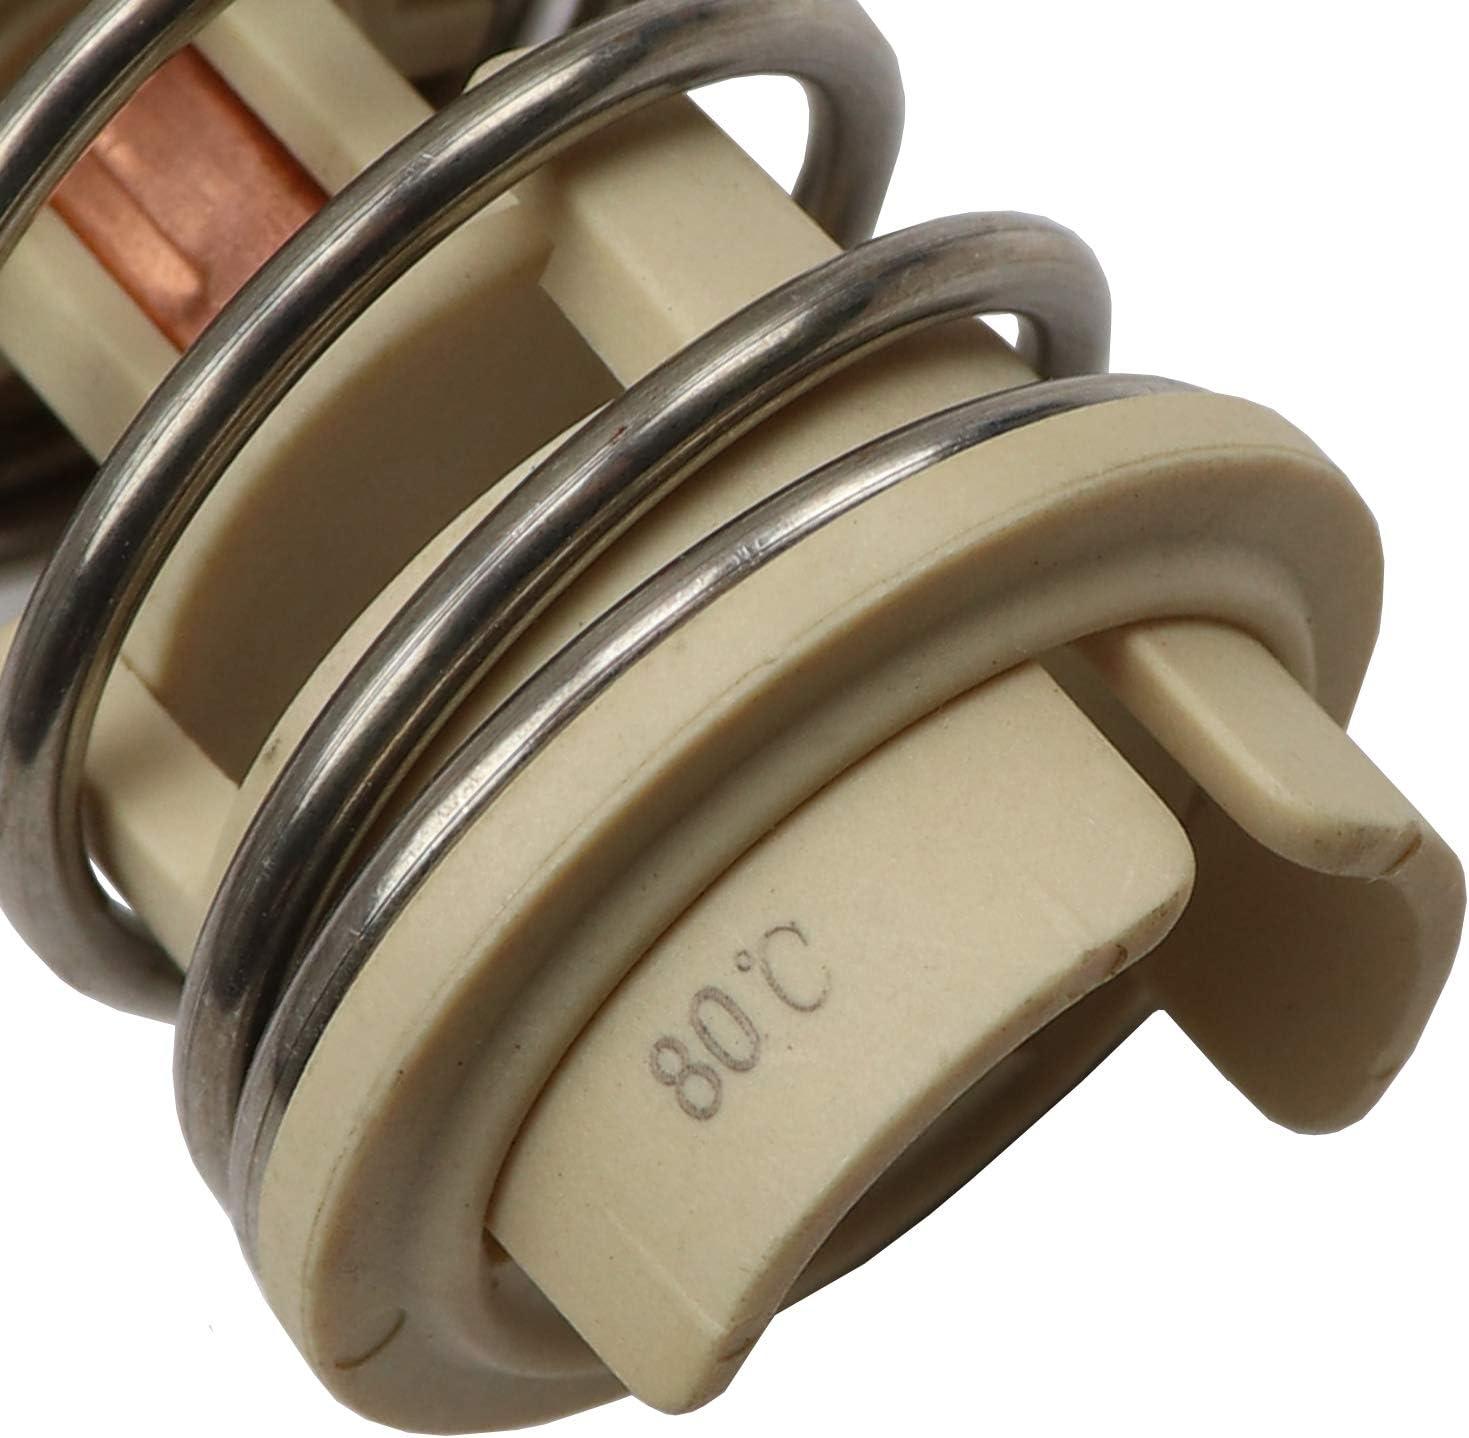 BECKARNLEY 143-0942 Thermostat